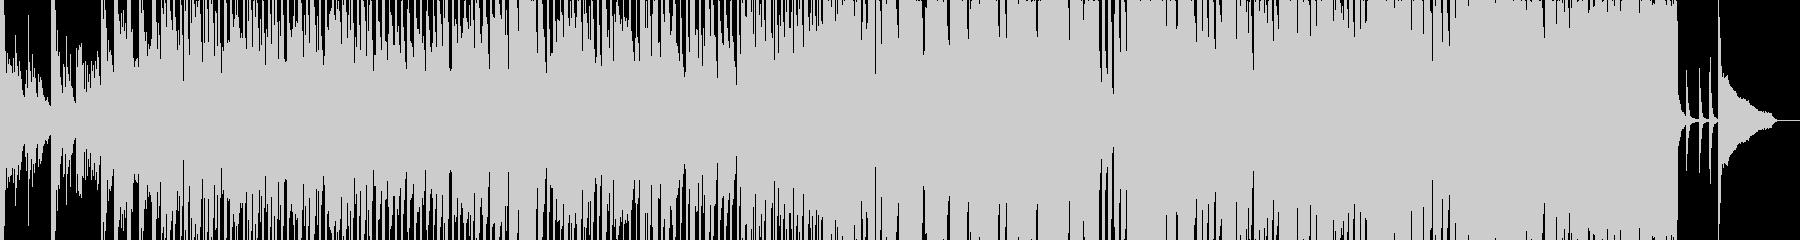 BASIE スイングしなきゃジャズじゃなの未再生の波形